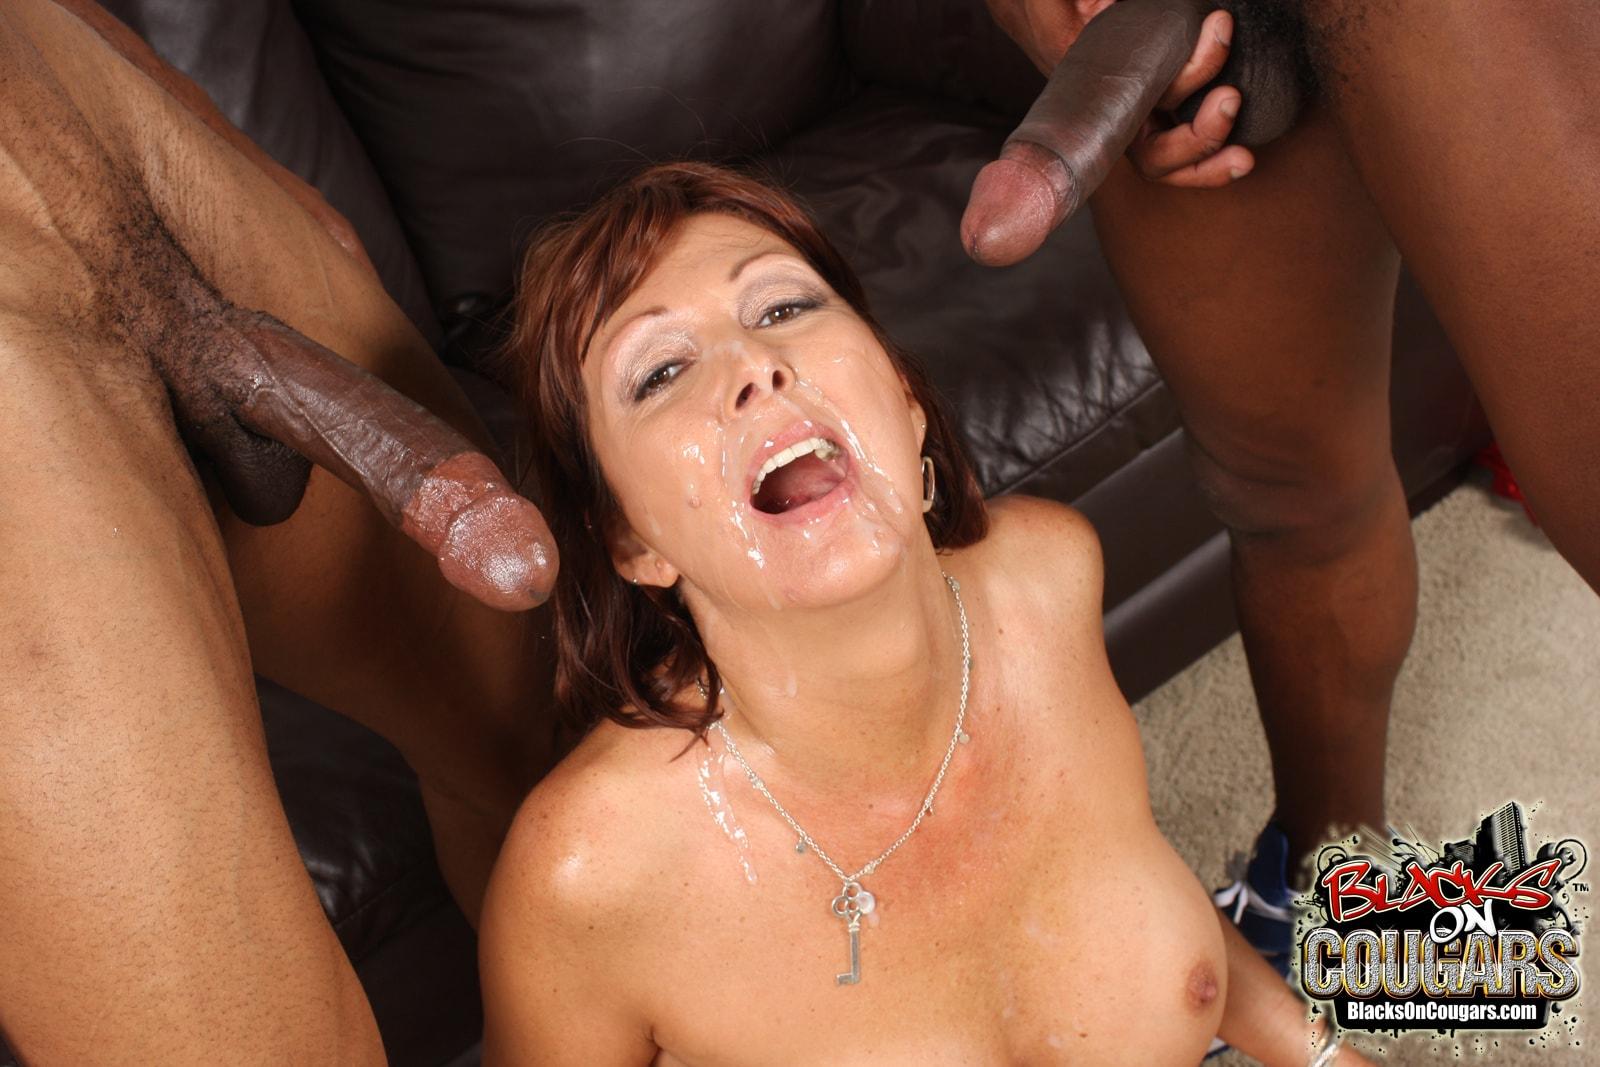 Dogfart '- Blacks On Cougars' starring Desi Foxx (Photo 30)